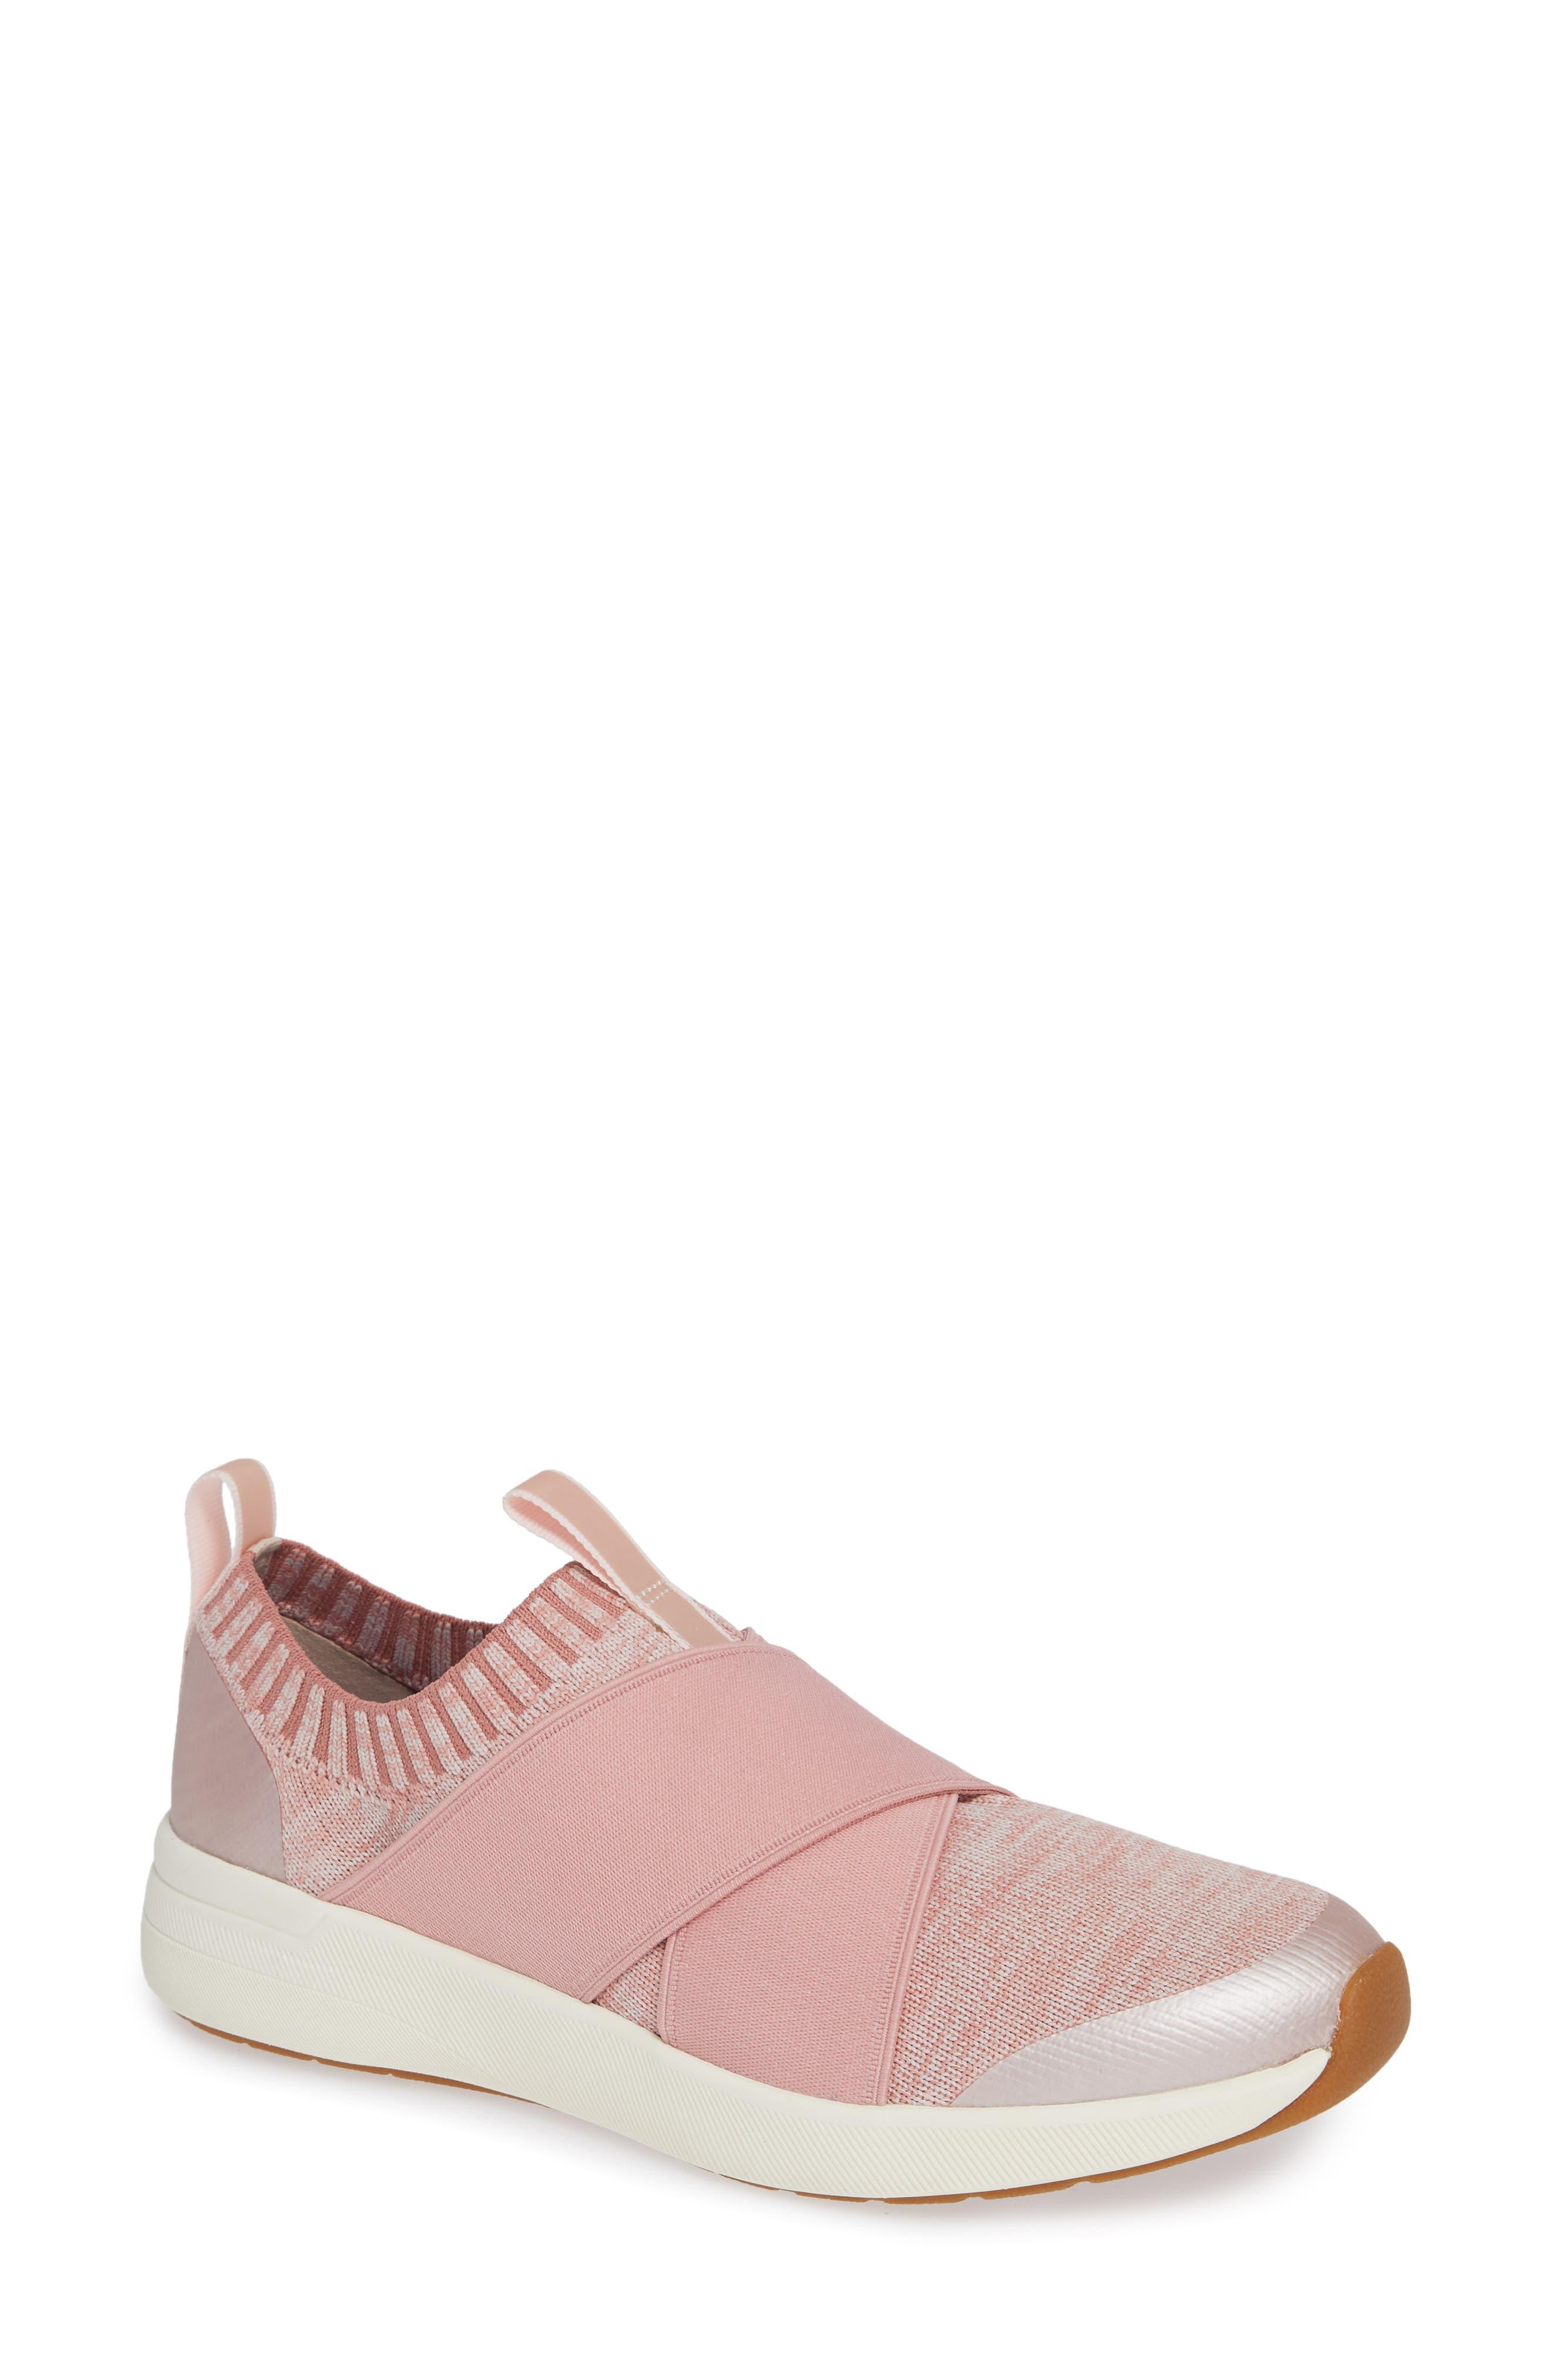 KEDS<SUP>®</SUP> Studio Jumper Knit Sneaker, Main, color, LIGHT PINK